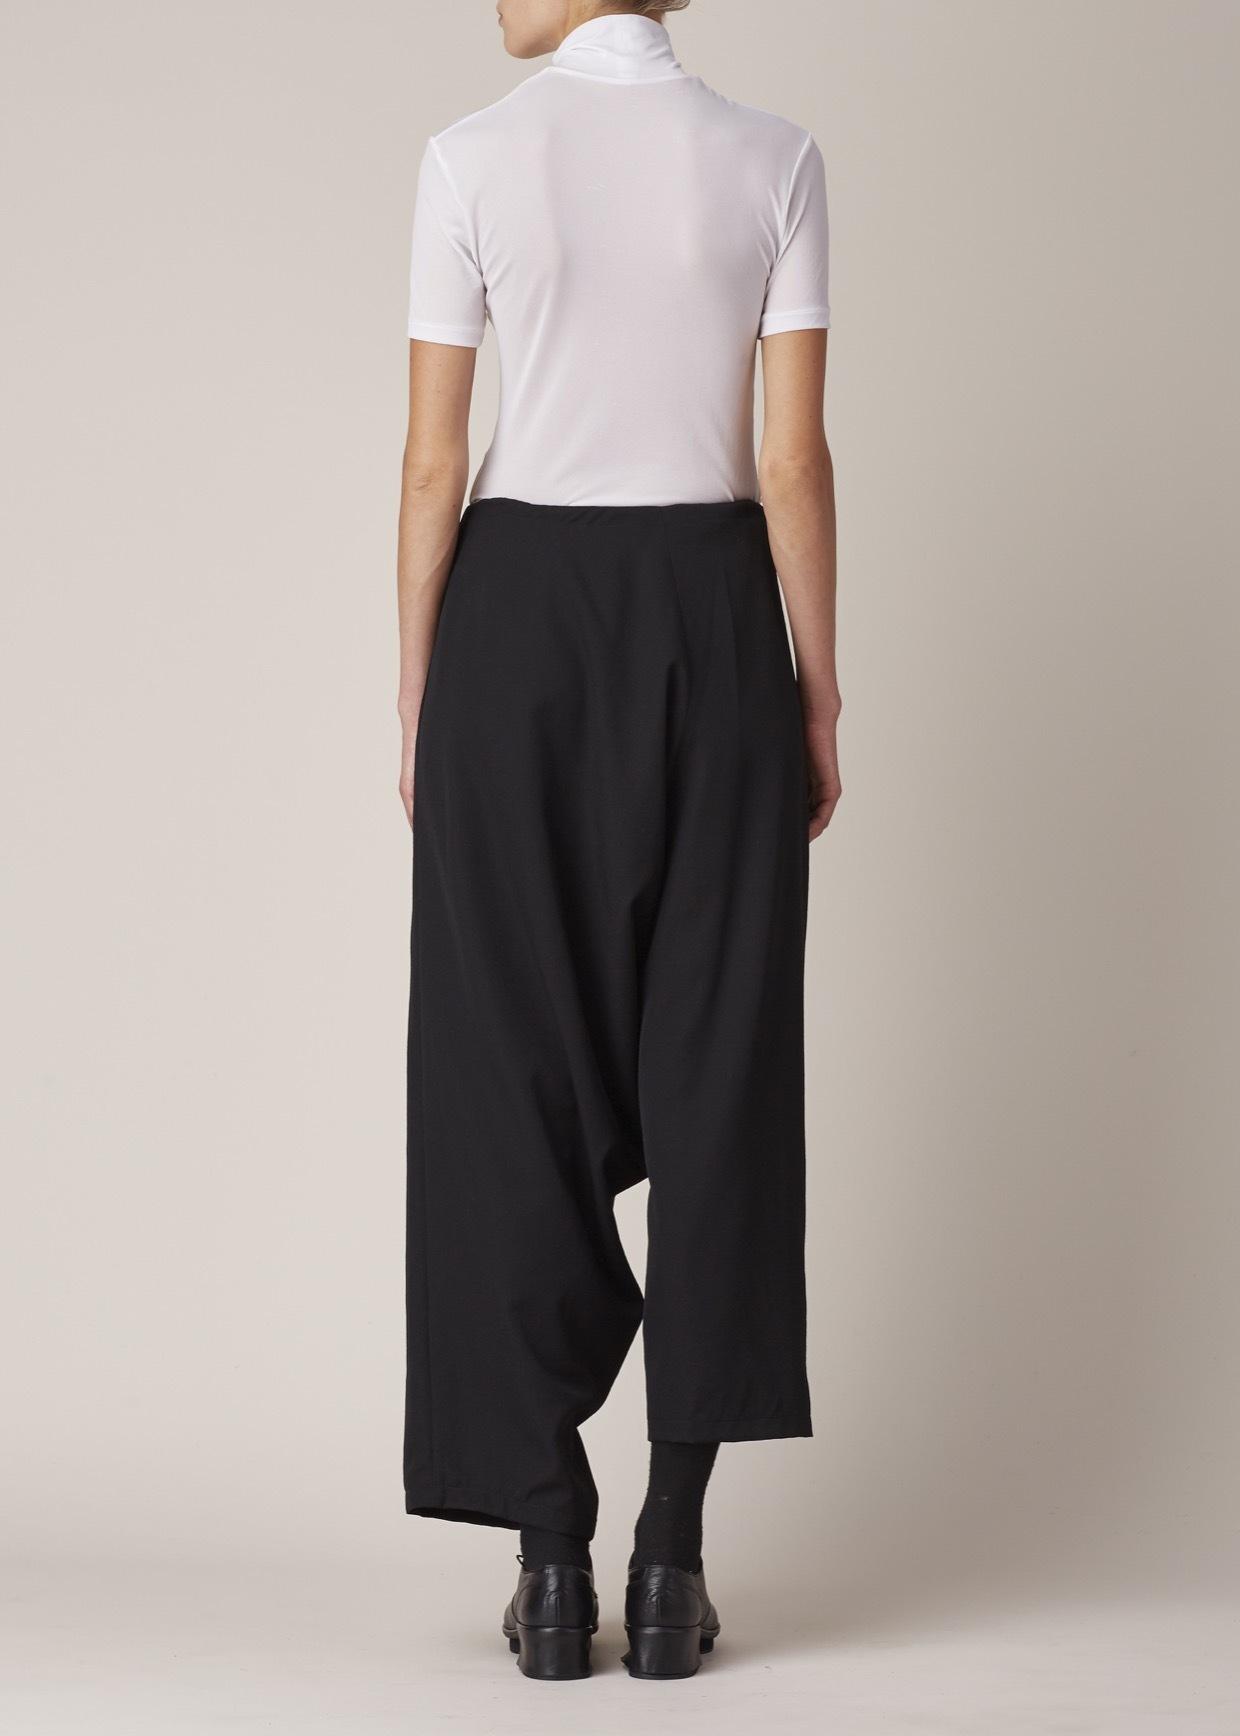 wide leg jumpsuit - Blue Yohji Yamamoto Cheap Sale Release Dates For Sale Buy Authentic Online Outlet Best Sale rVIFK